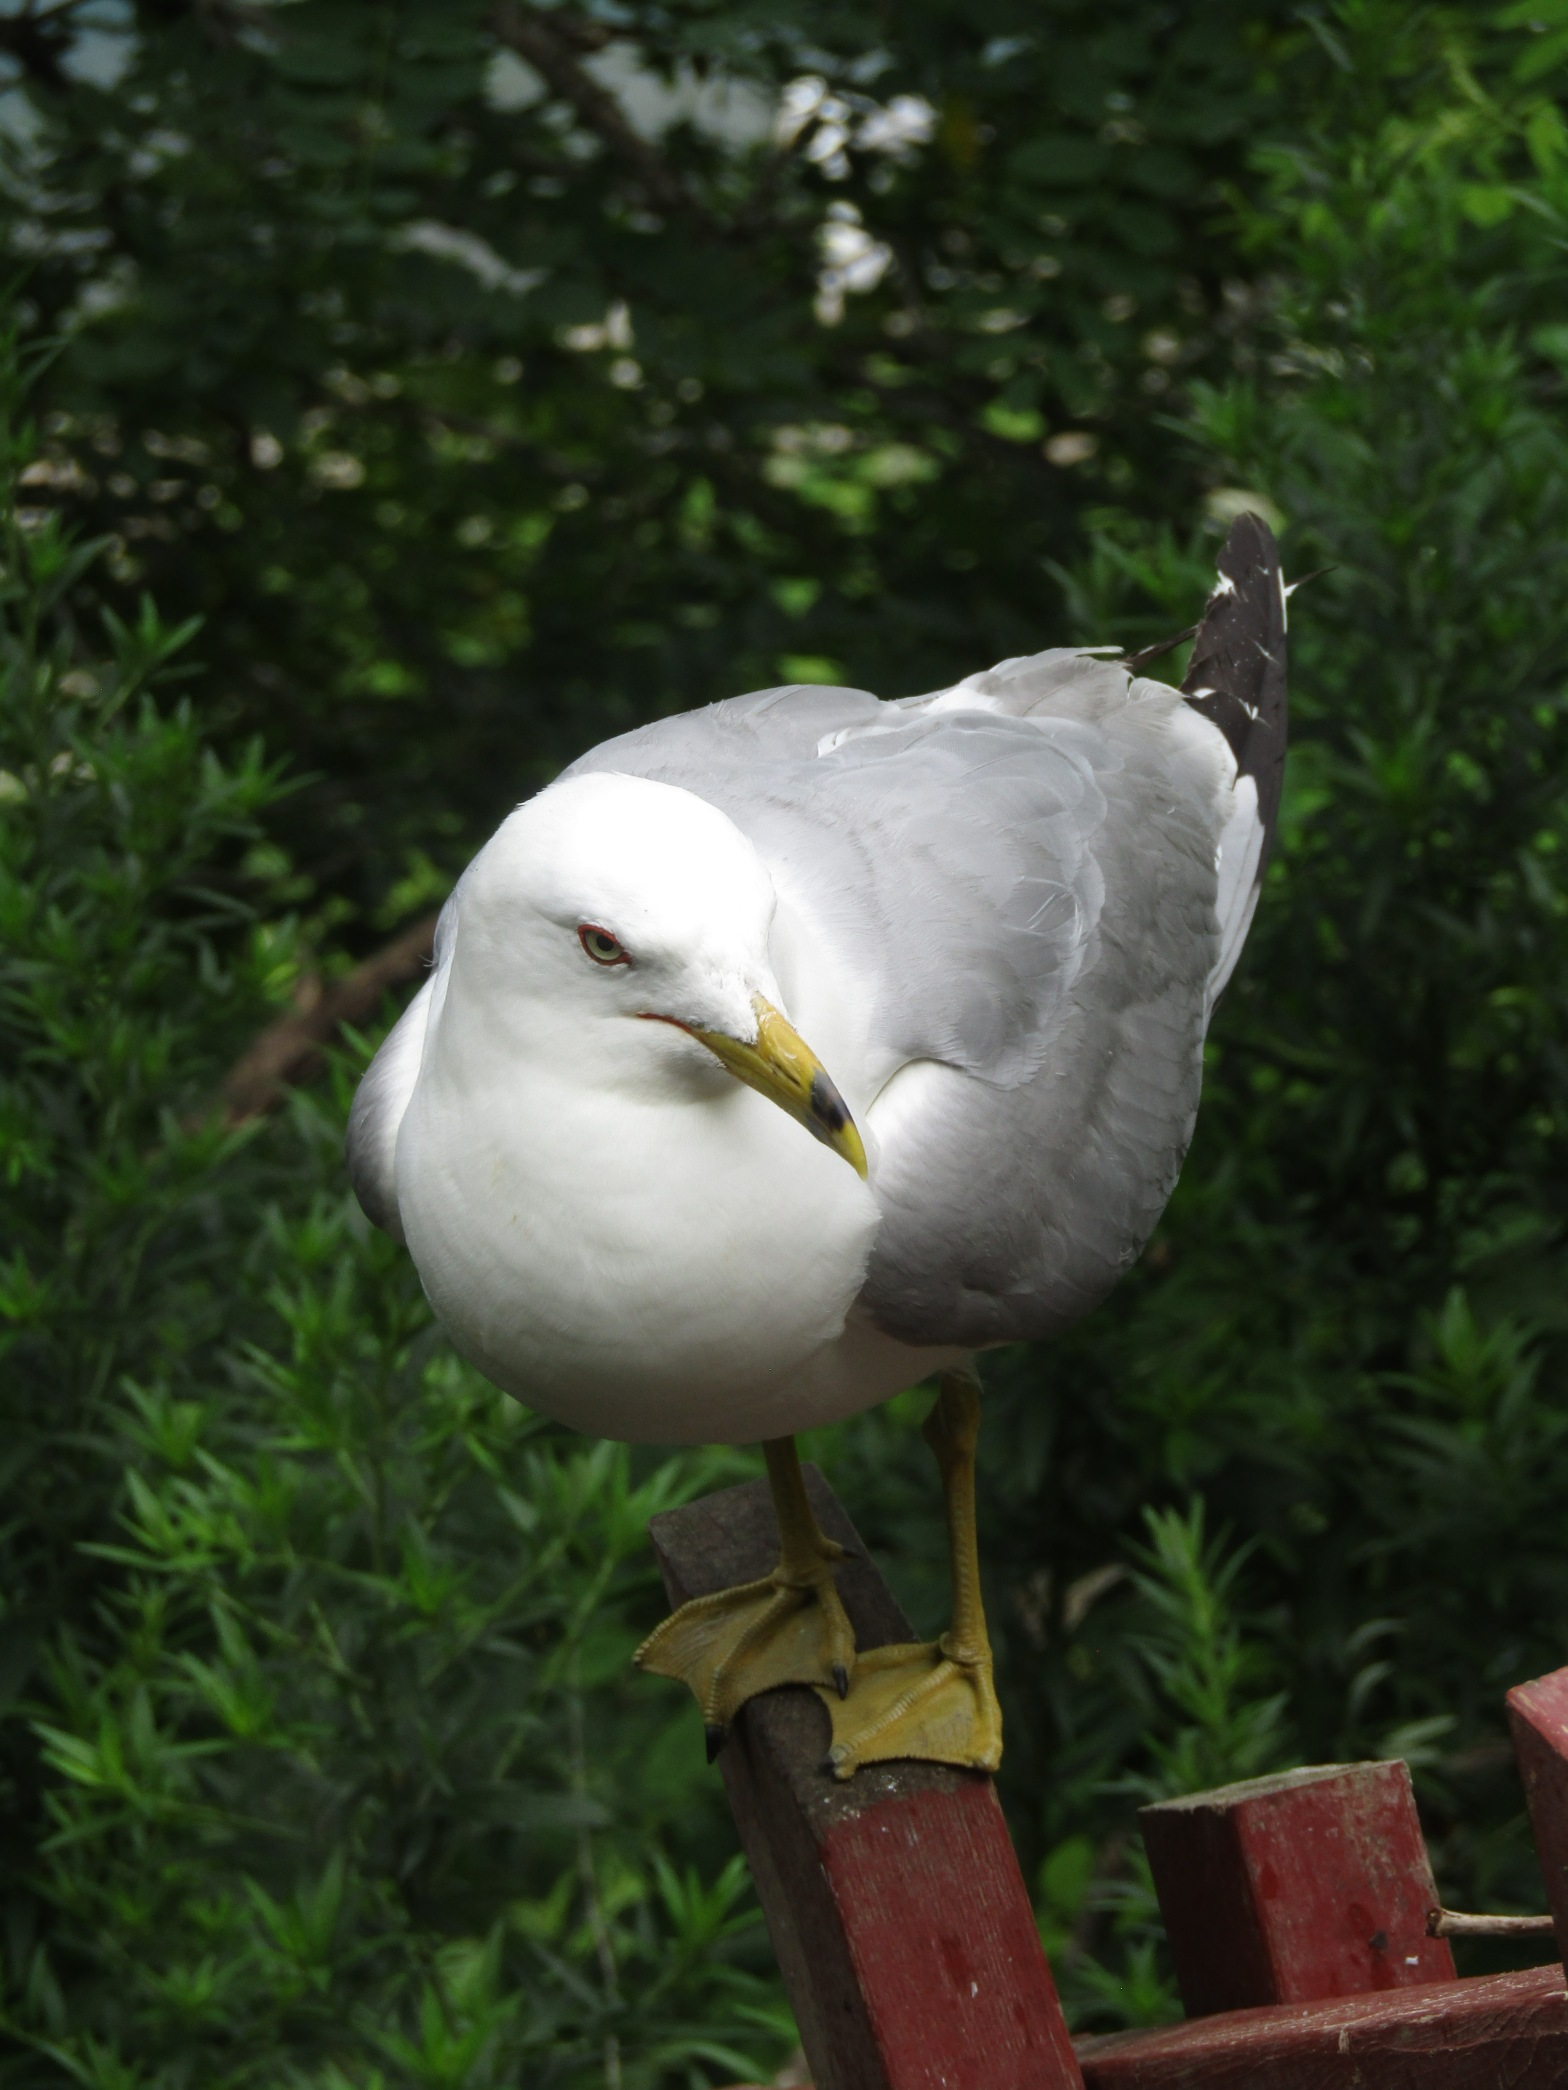 A seagull perching on a wooden post at Niagara Falls State Park in Niagara Falls New York